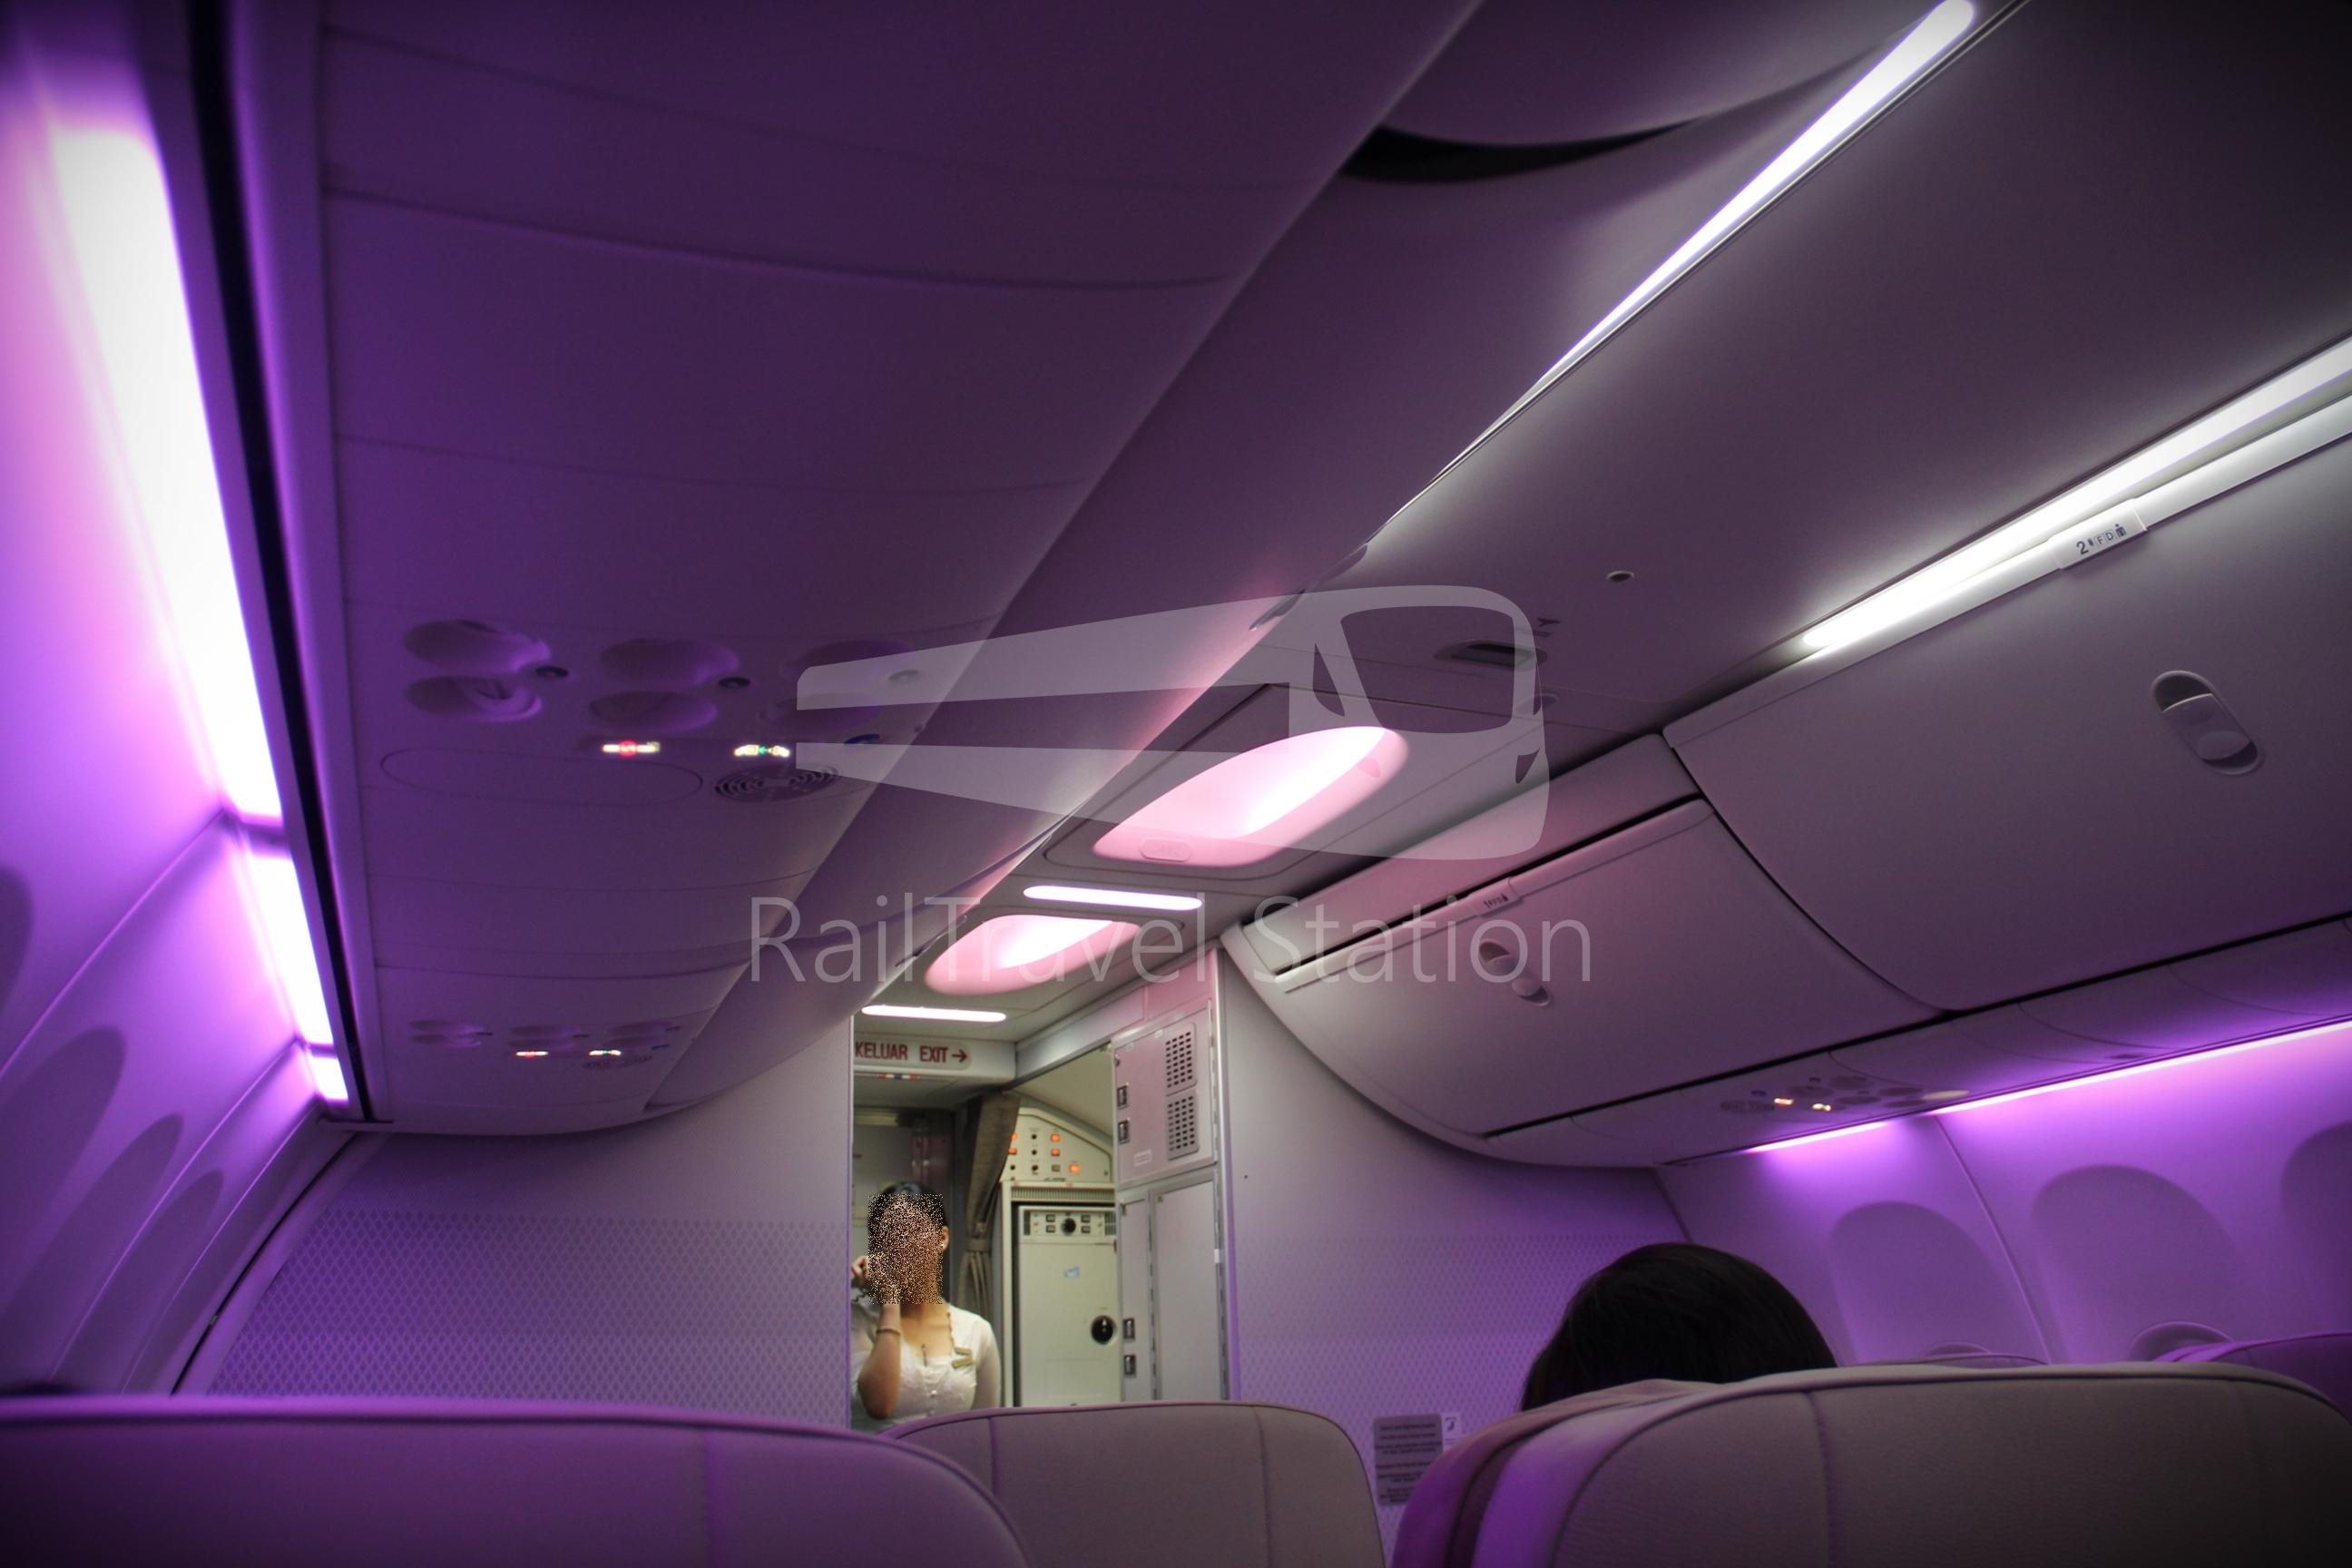 Malindo Air/Batik Air Malaysia OD805: Last Flight from Kuala Lumpur to Singapore by Business Class